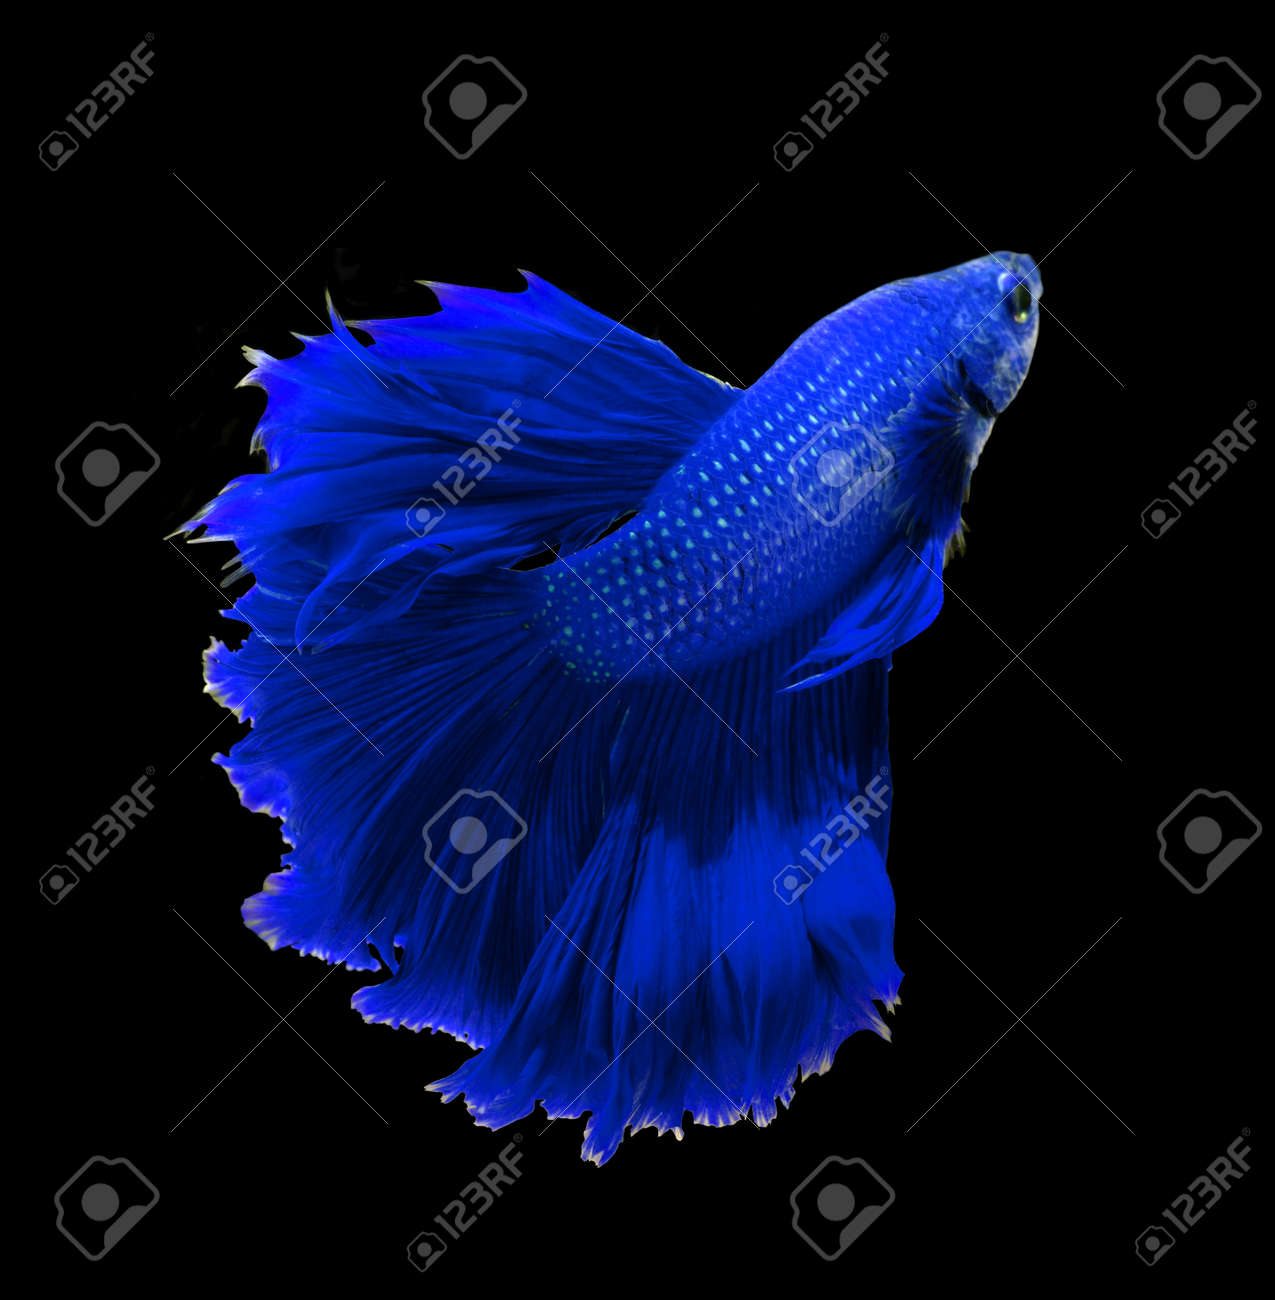 blue dragon siamese fighting fish betta fish isolated on black